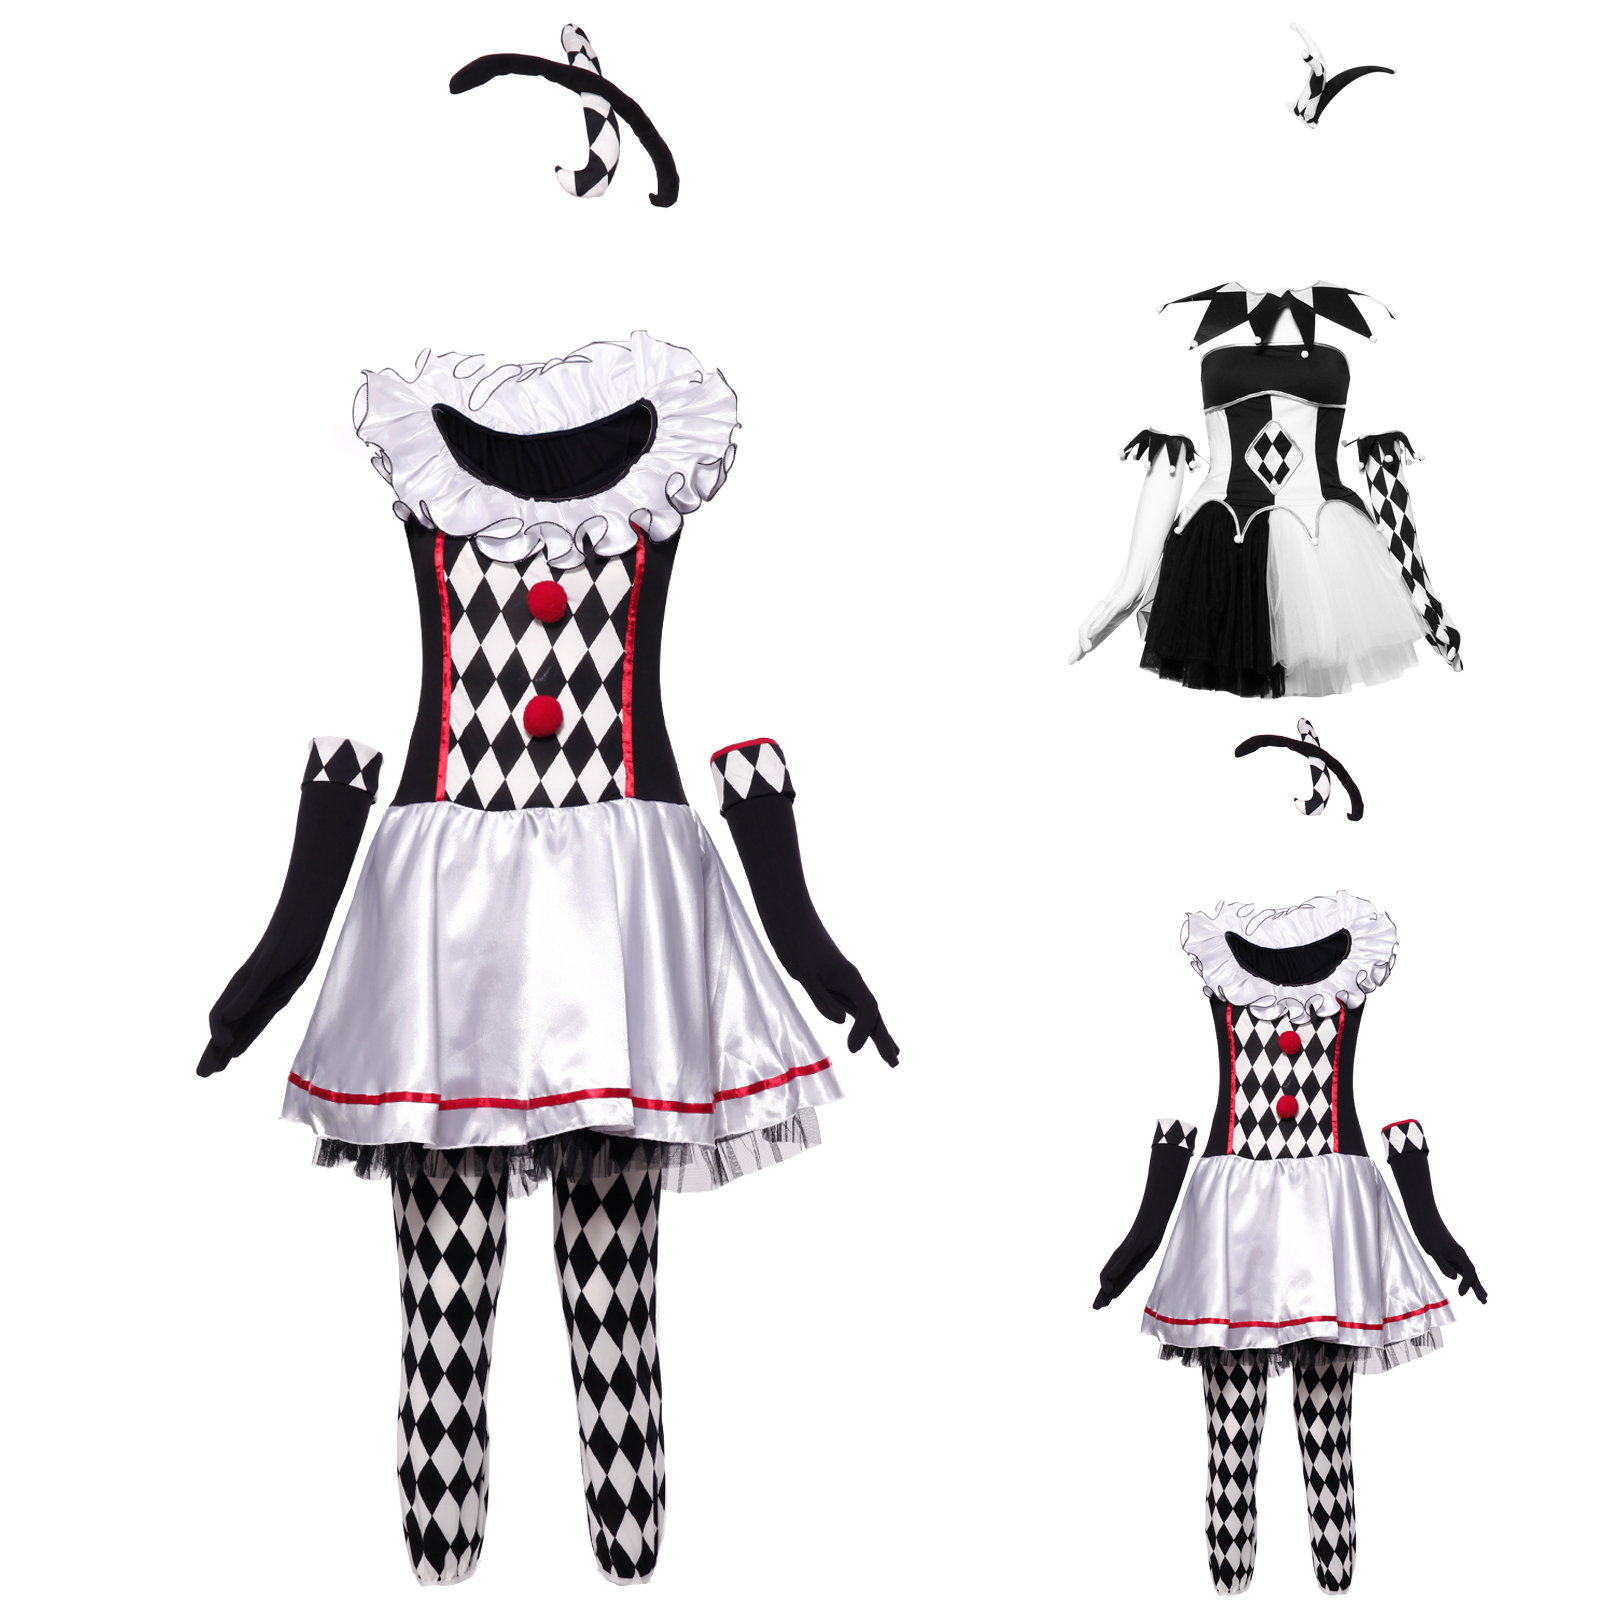 pierrot harlekin clown schwarz wei damen kost m karneval fasching circus outfit ebay. Black Bedroom Furniture Sets. Home Design Ideas